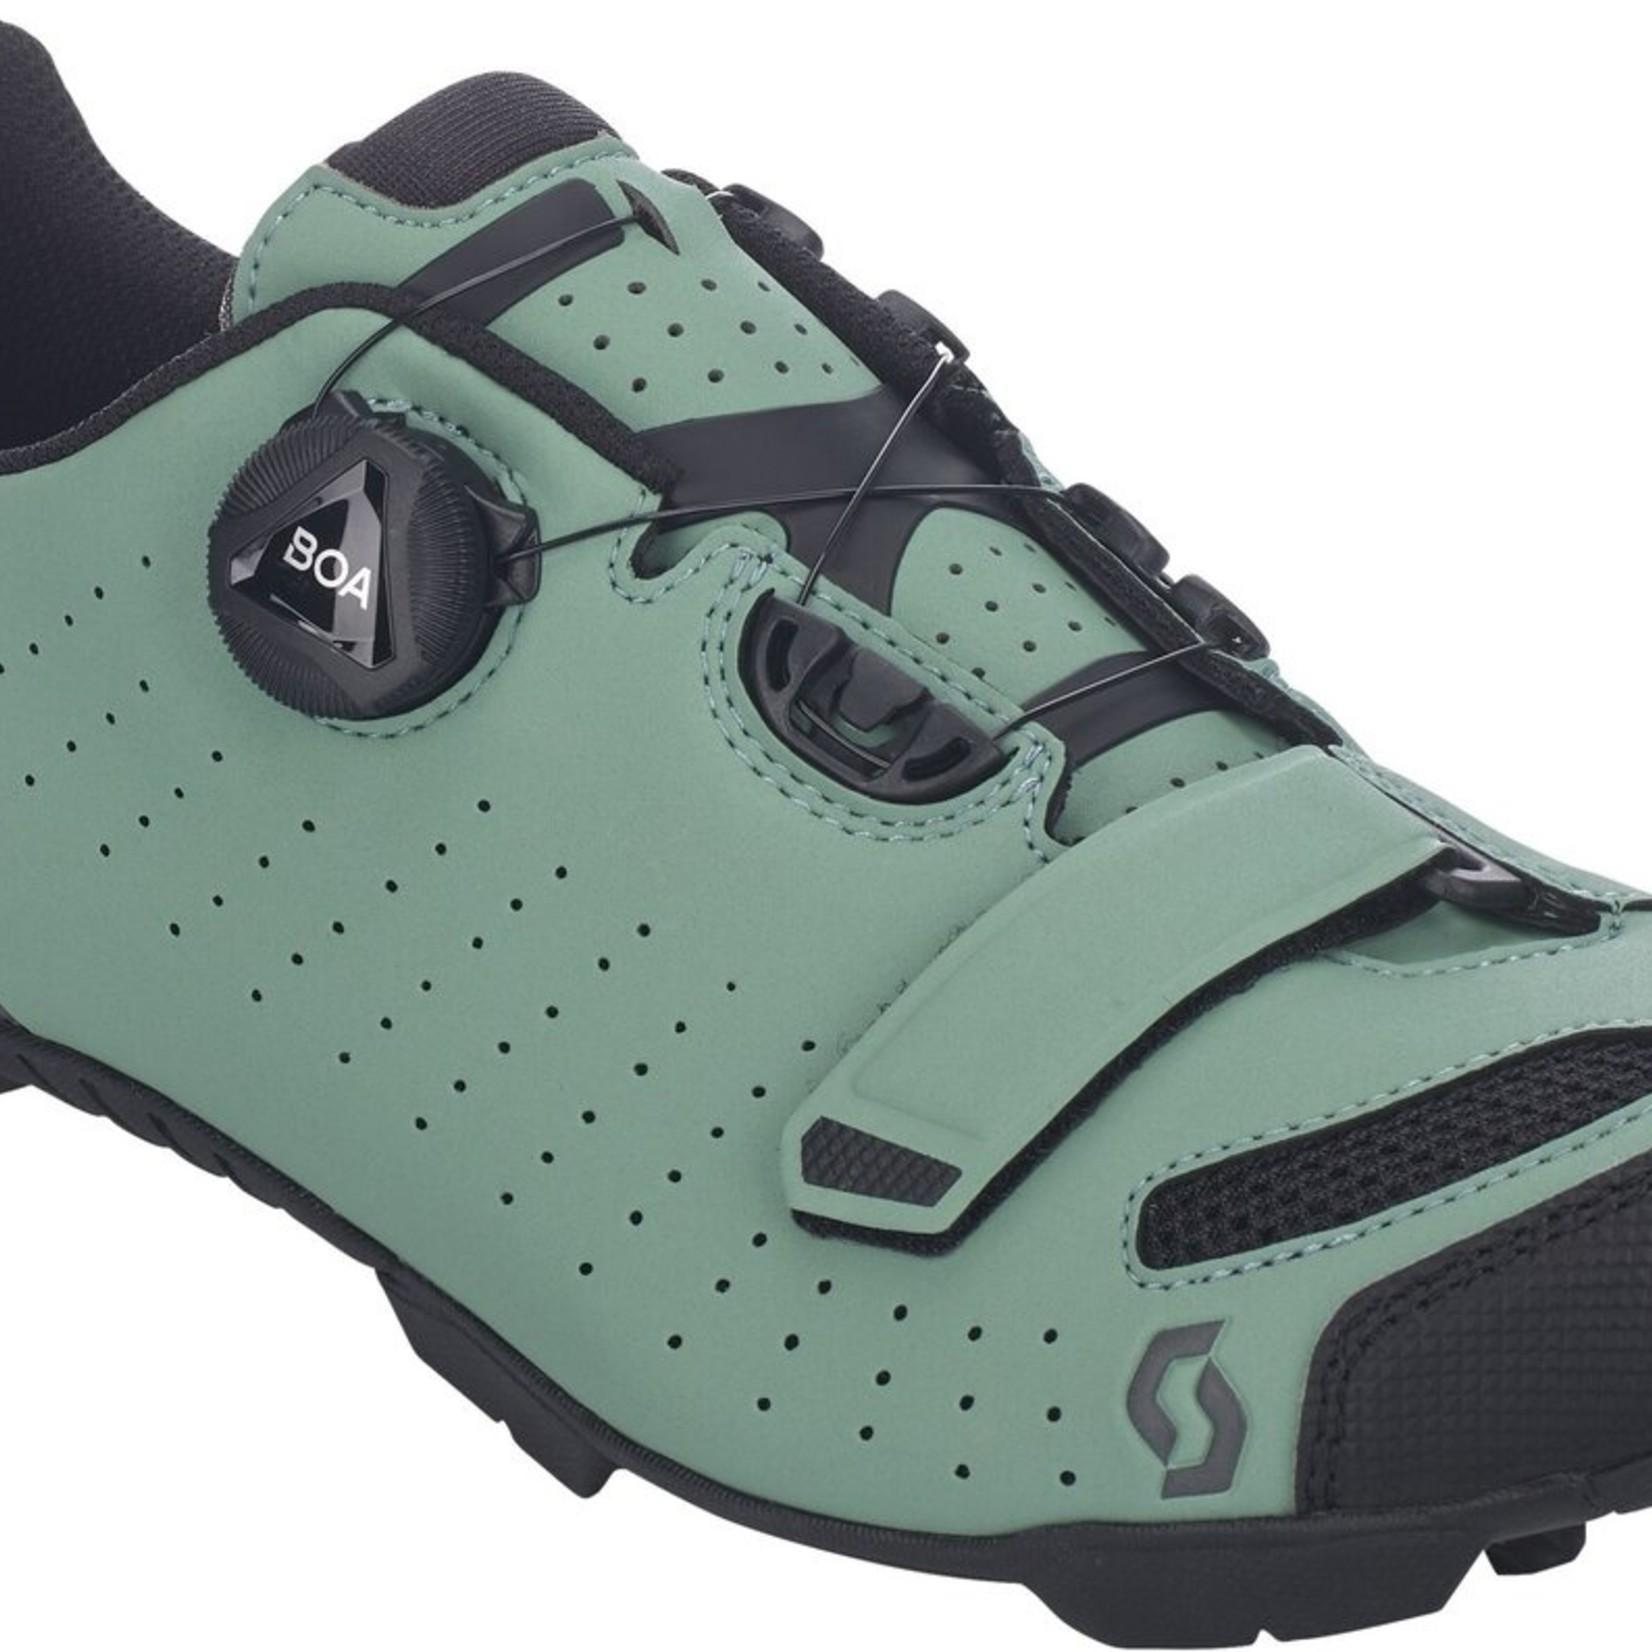 Scott SCO Shoe Mtb Comp Boa land gre/blk